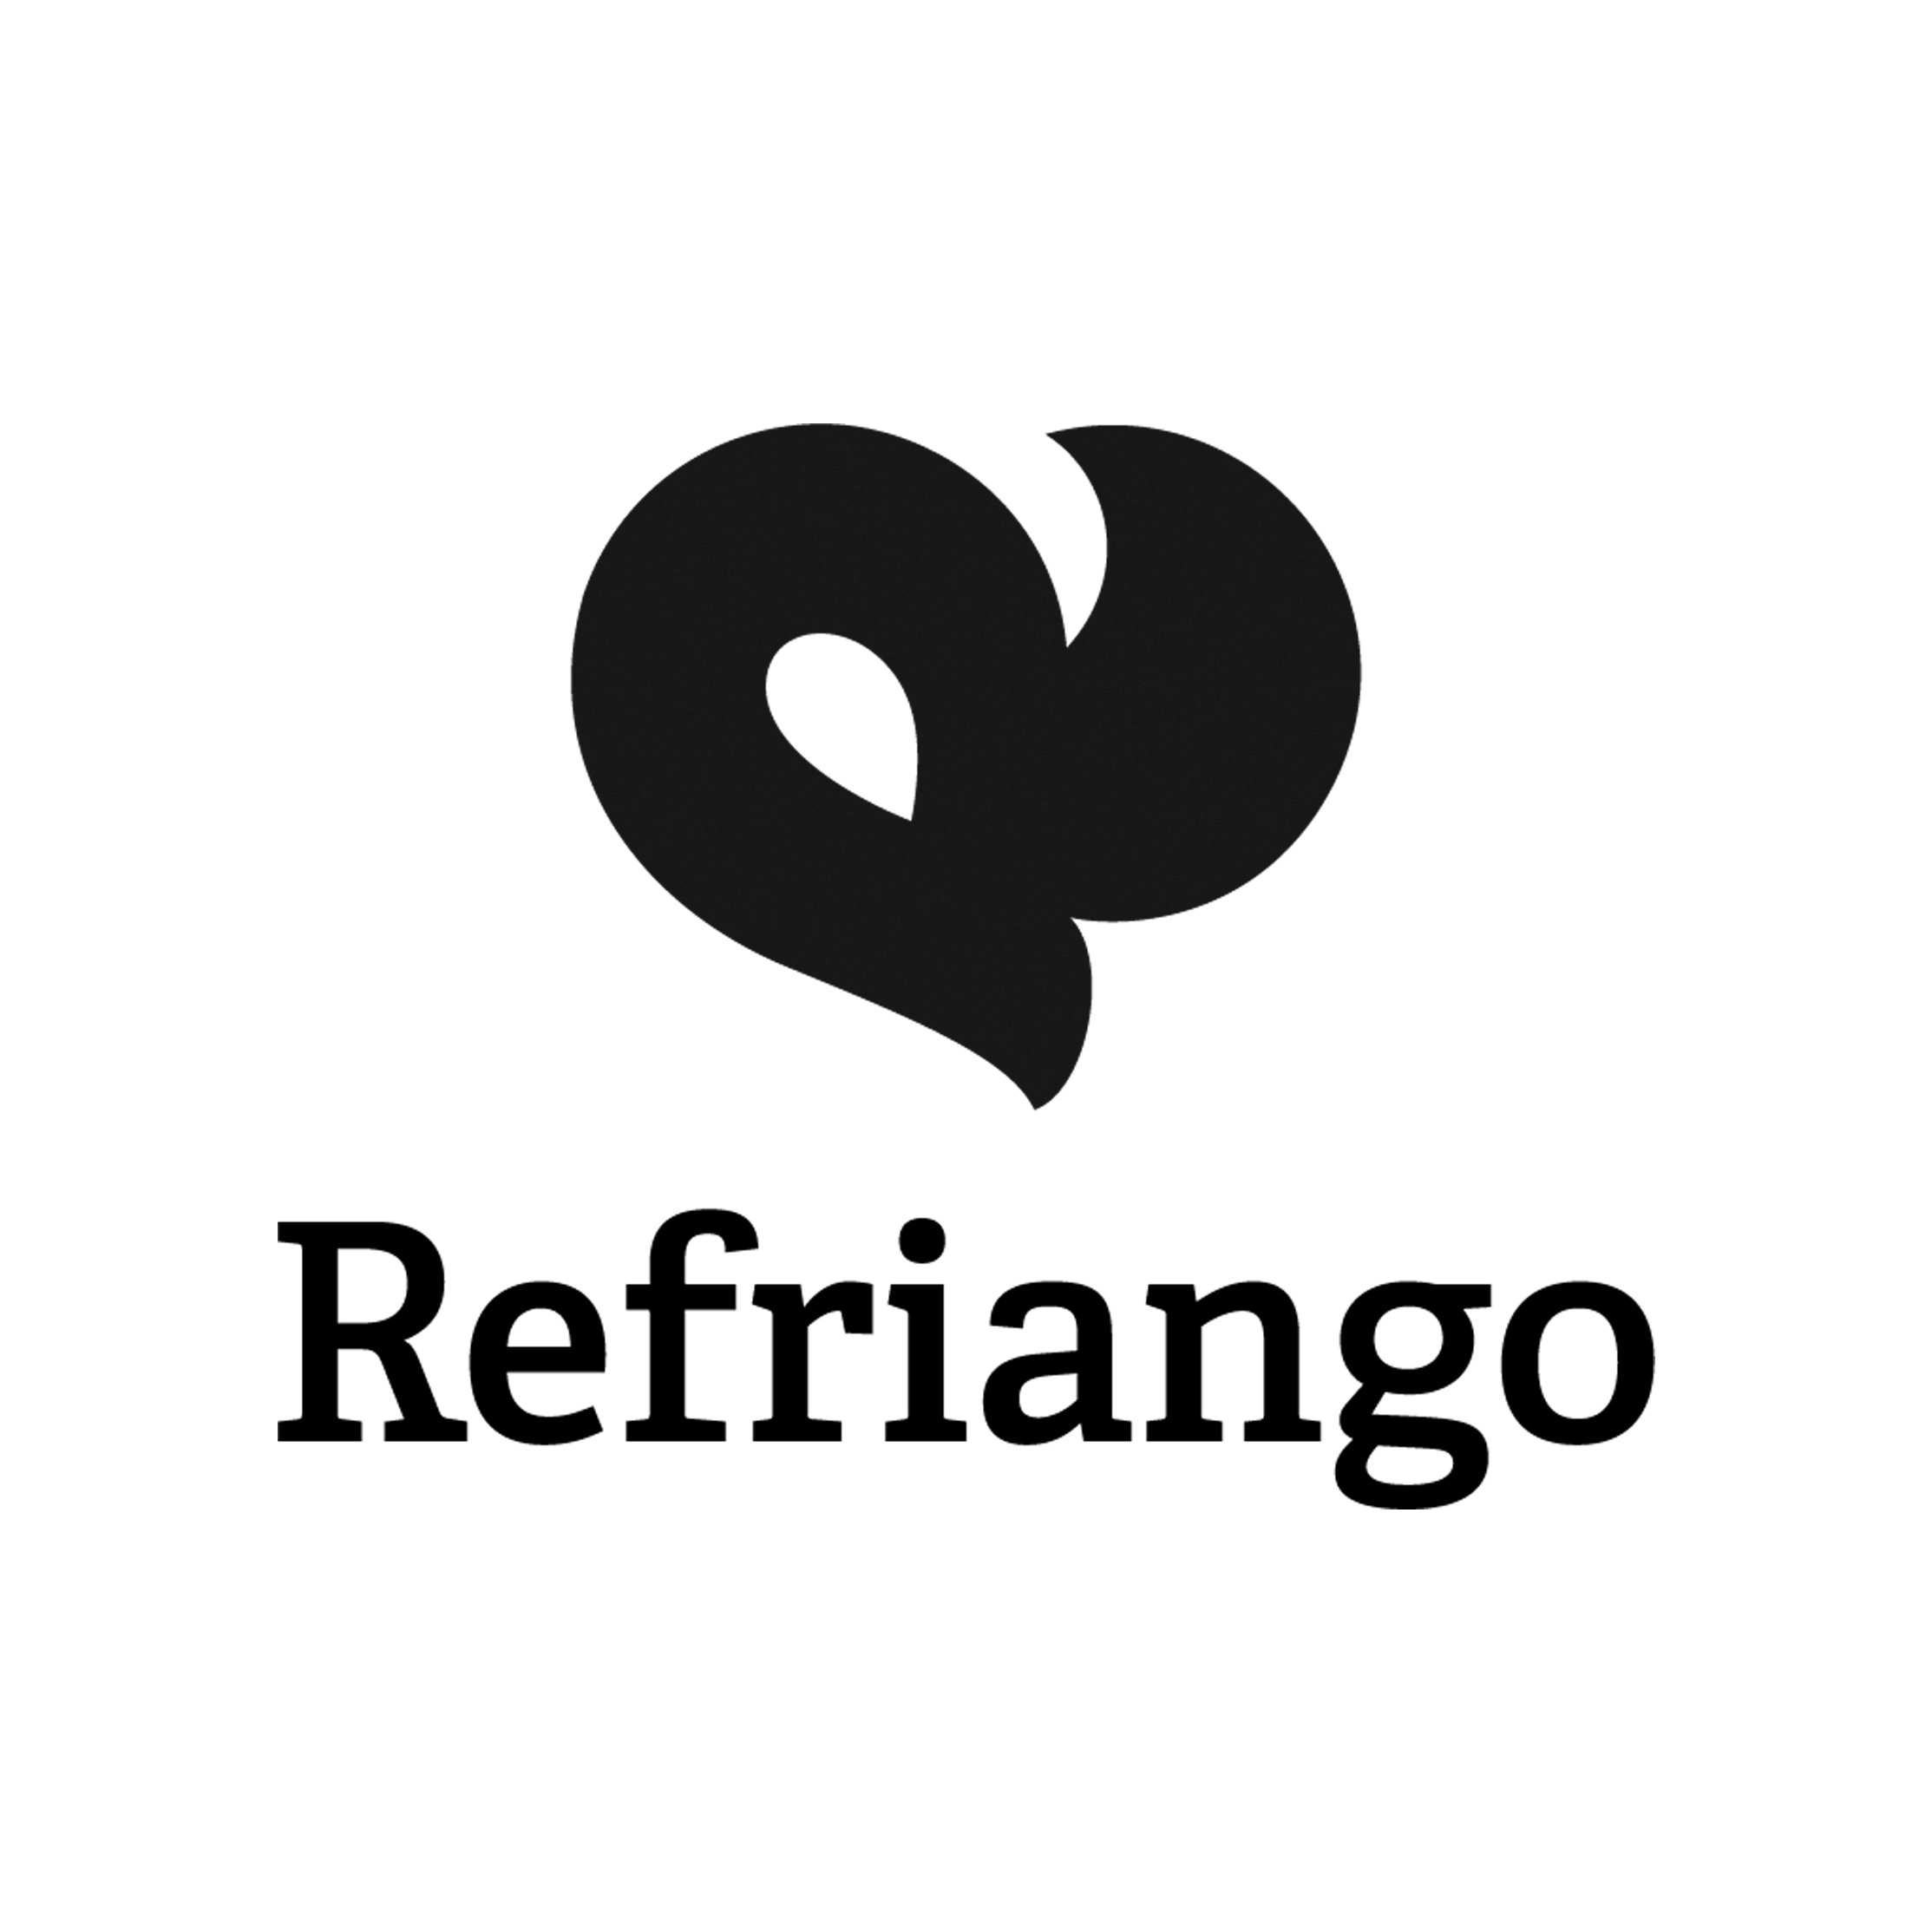 refriango_logo.jpg